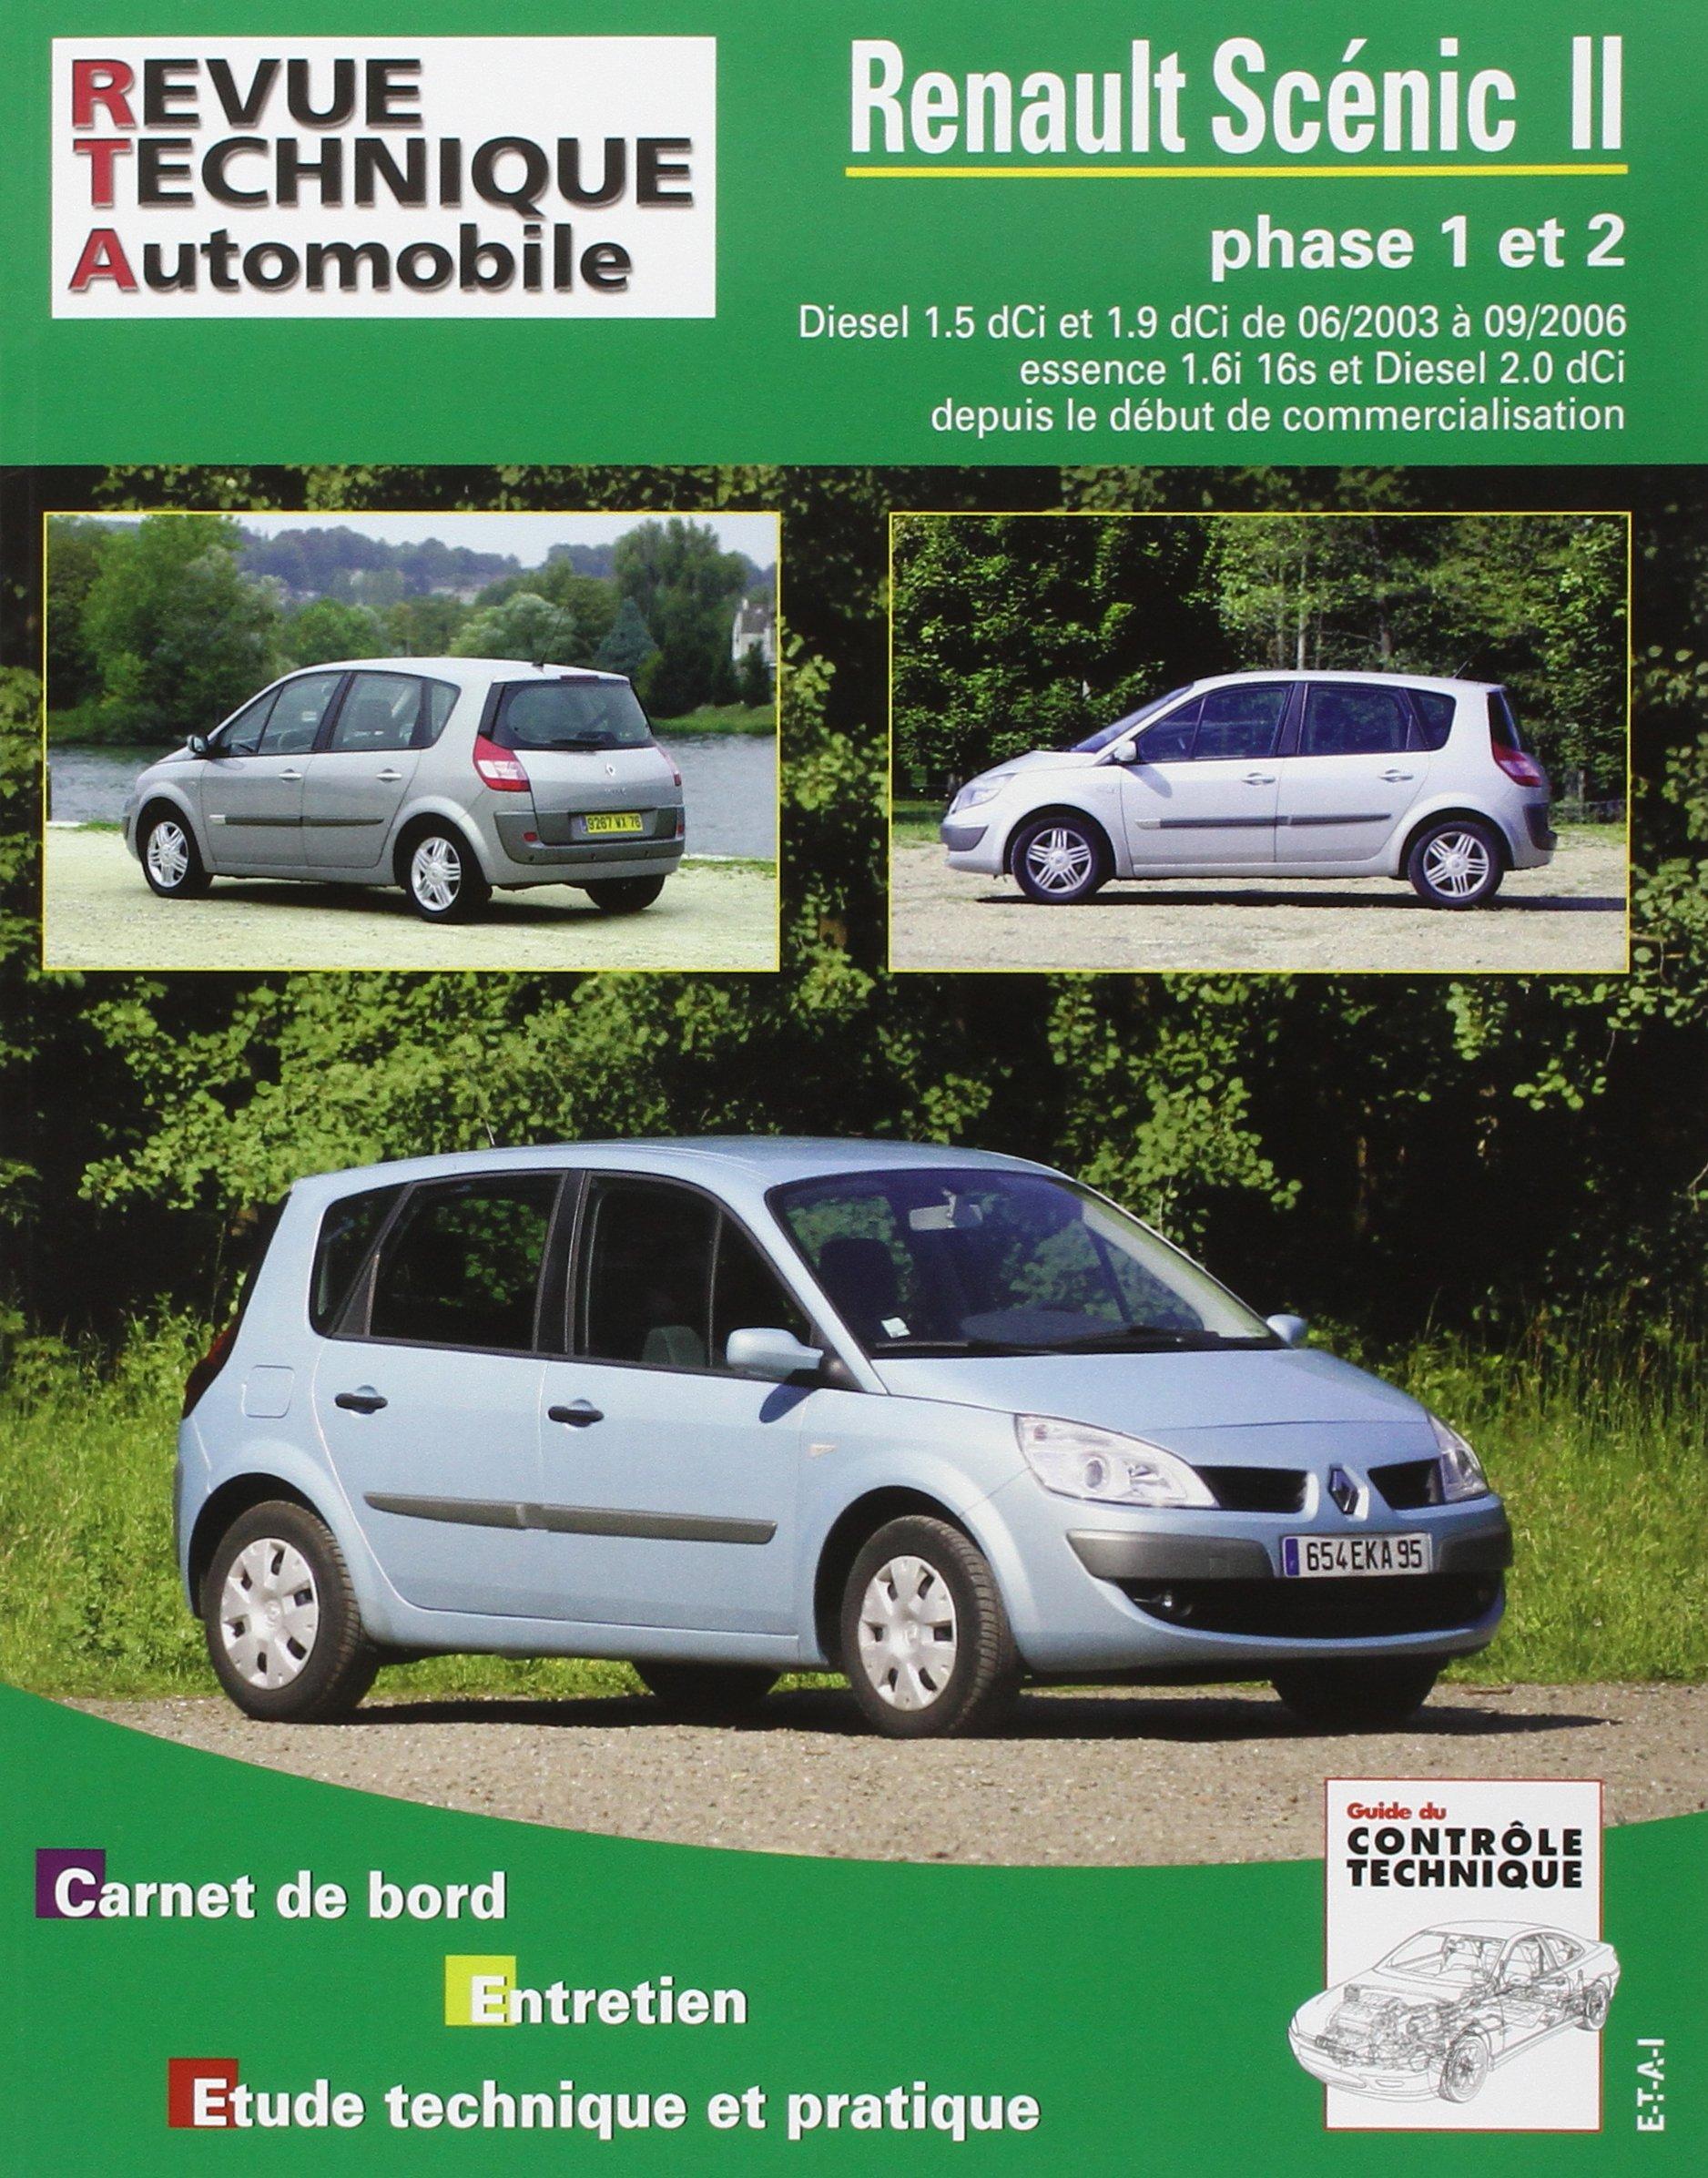 Rta 679.3 Renault scenic II diesel: Amazon.es: Etai: Libros en ...